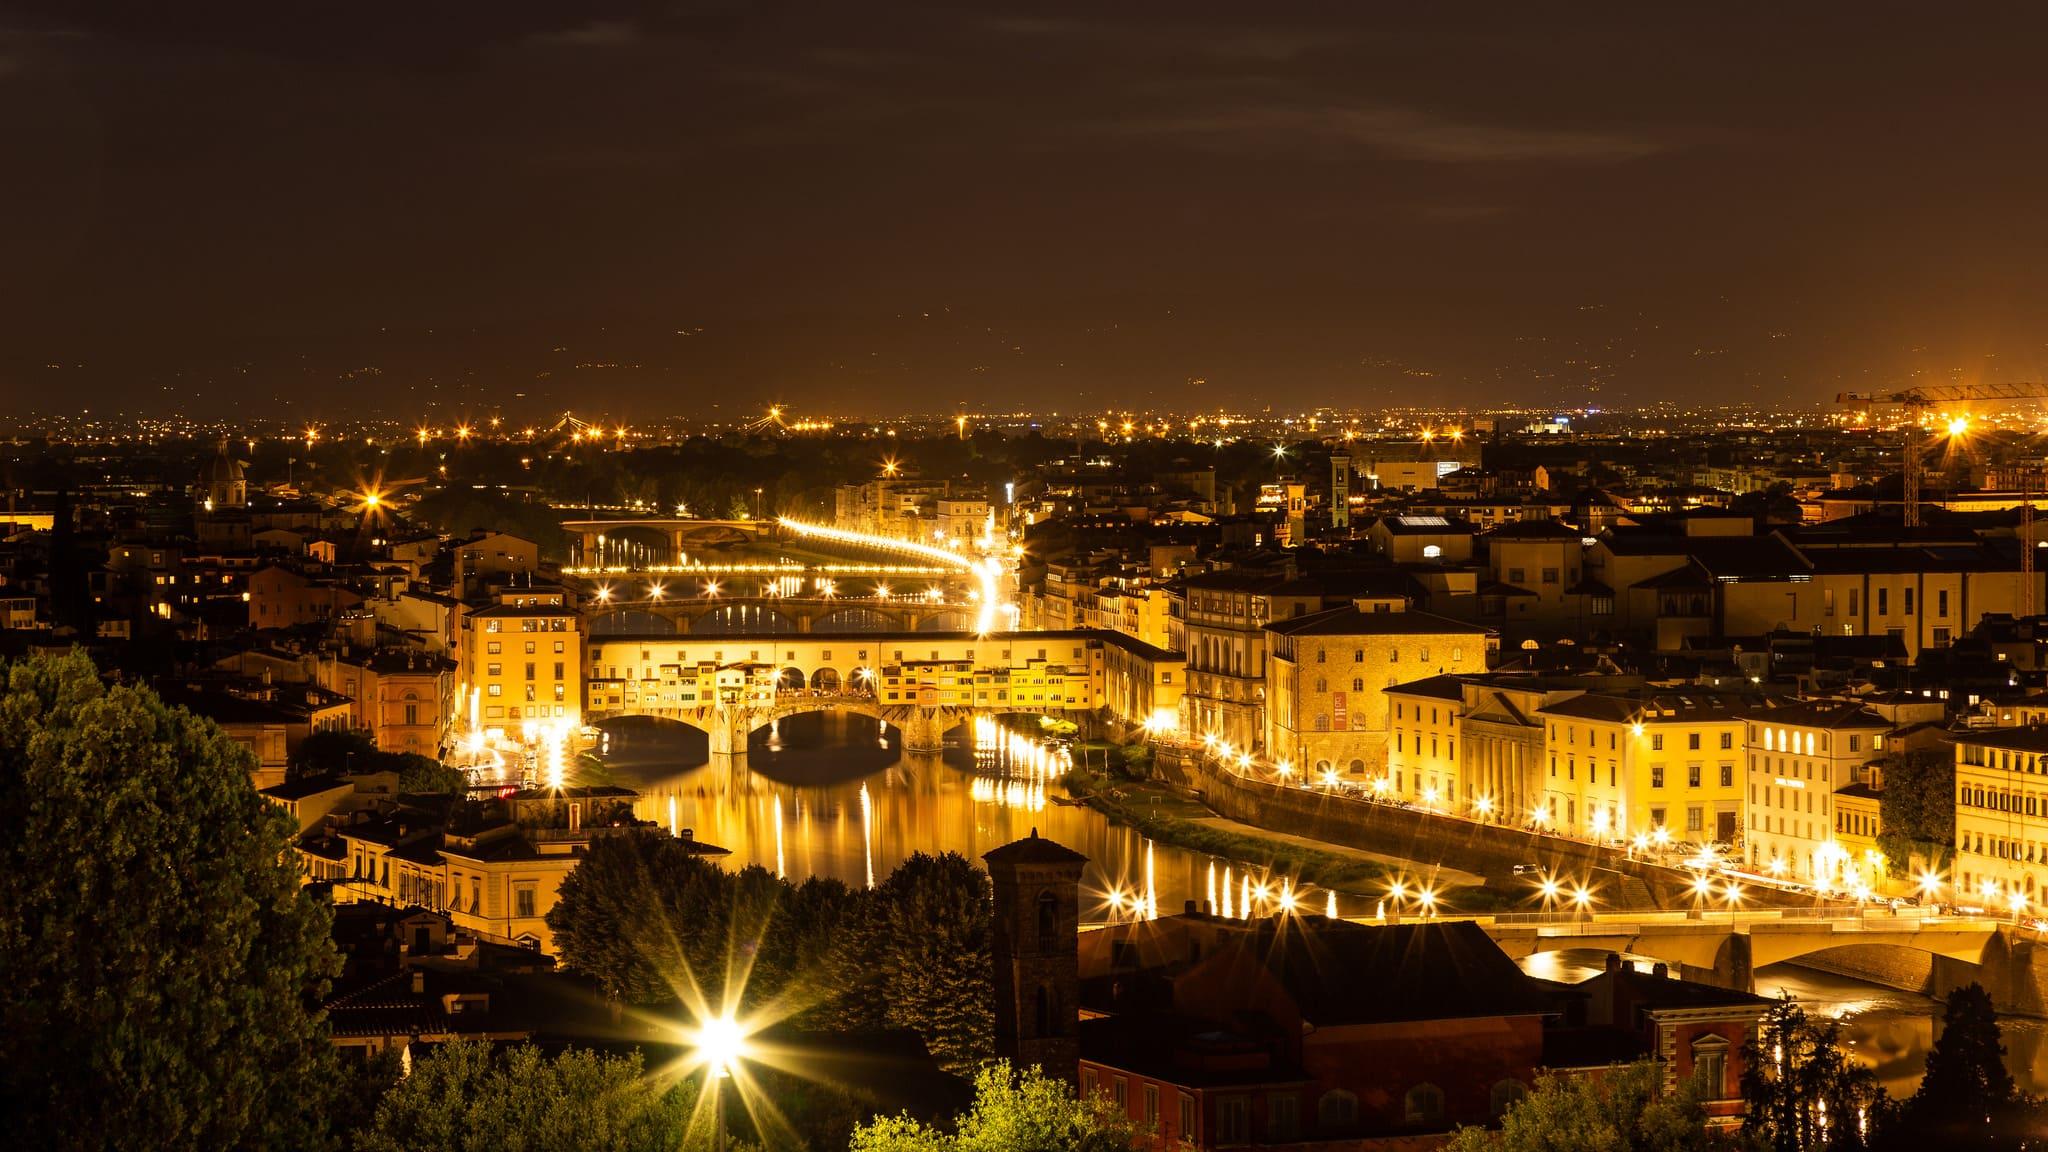 Firenze 31 Dicembre